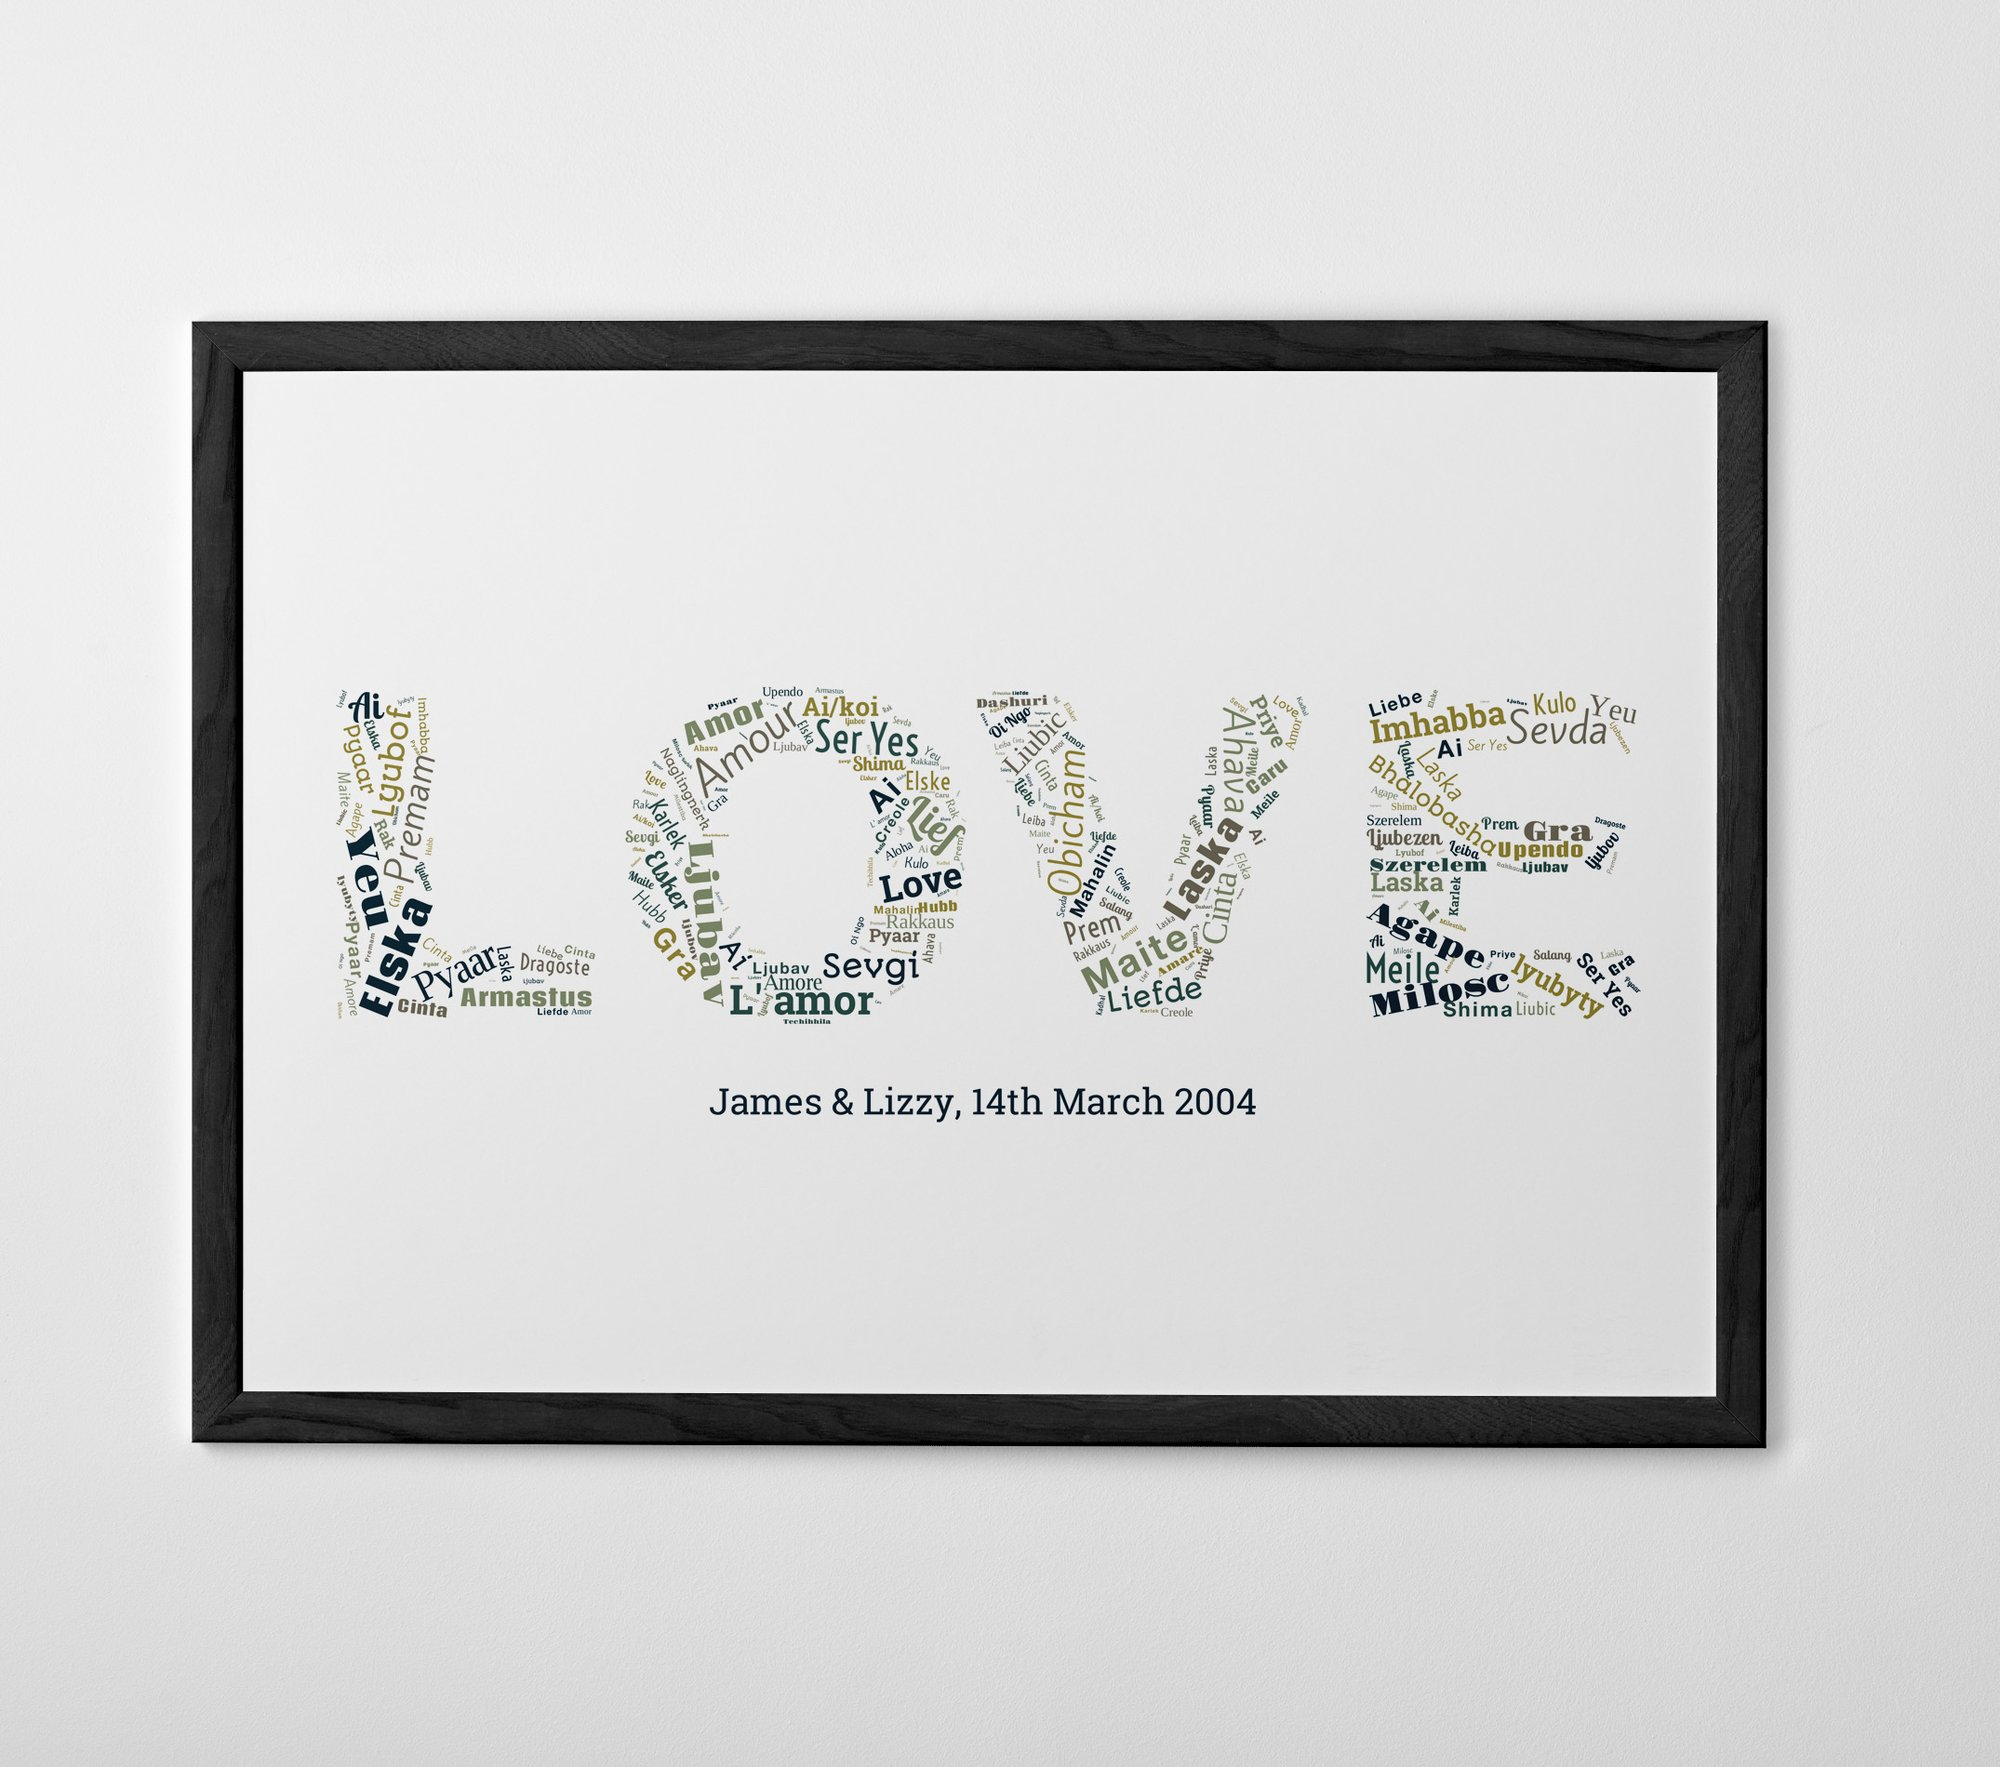 Personalised Words on Words Print, Poster or Canvas - Posterhaste